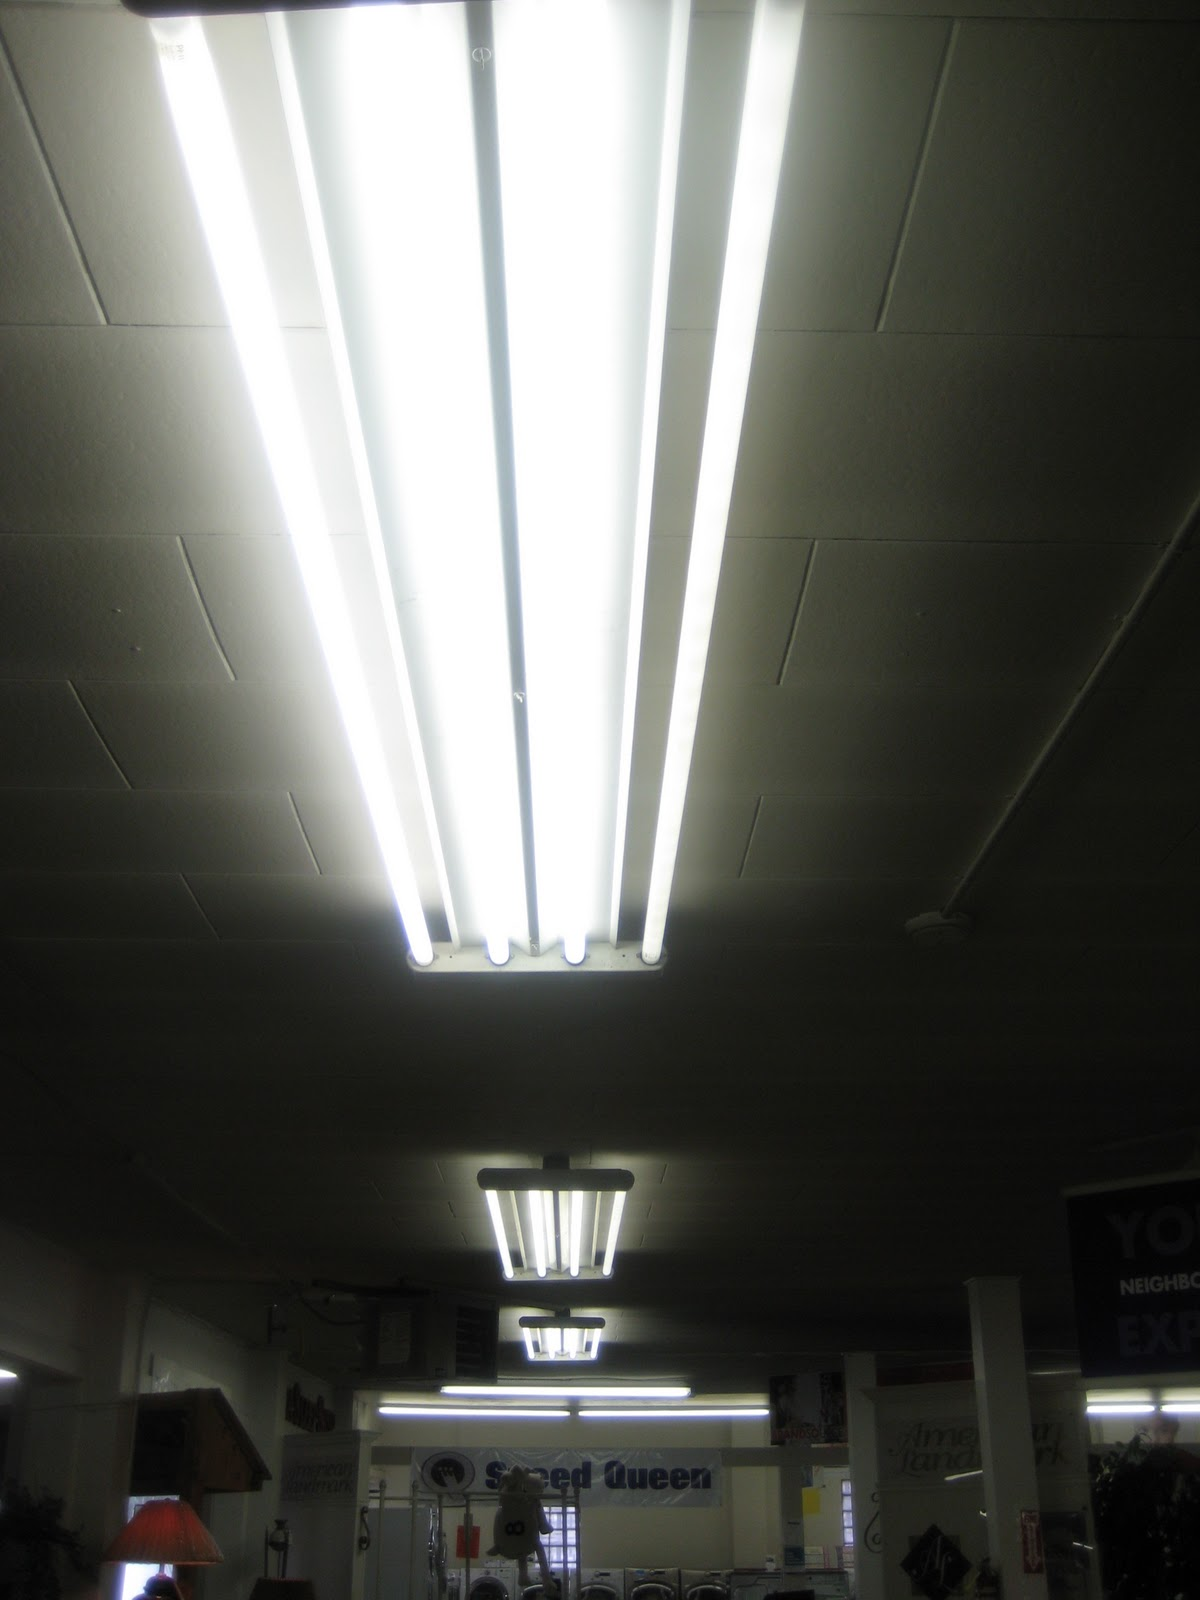 Boise lighting 8 foot light fixture upgrade beforeg arubaitofo Images